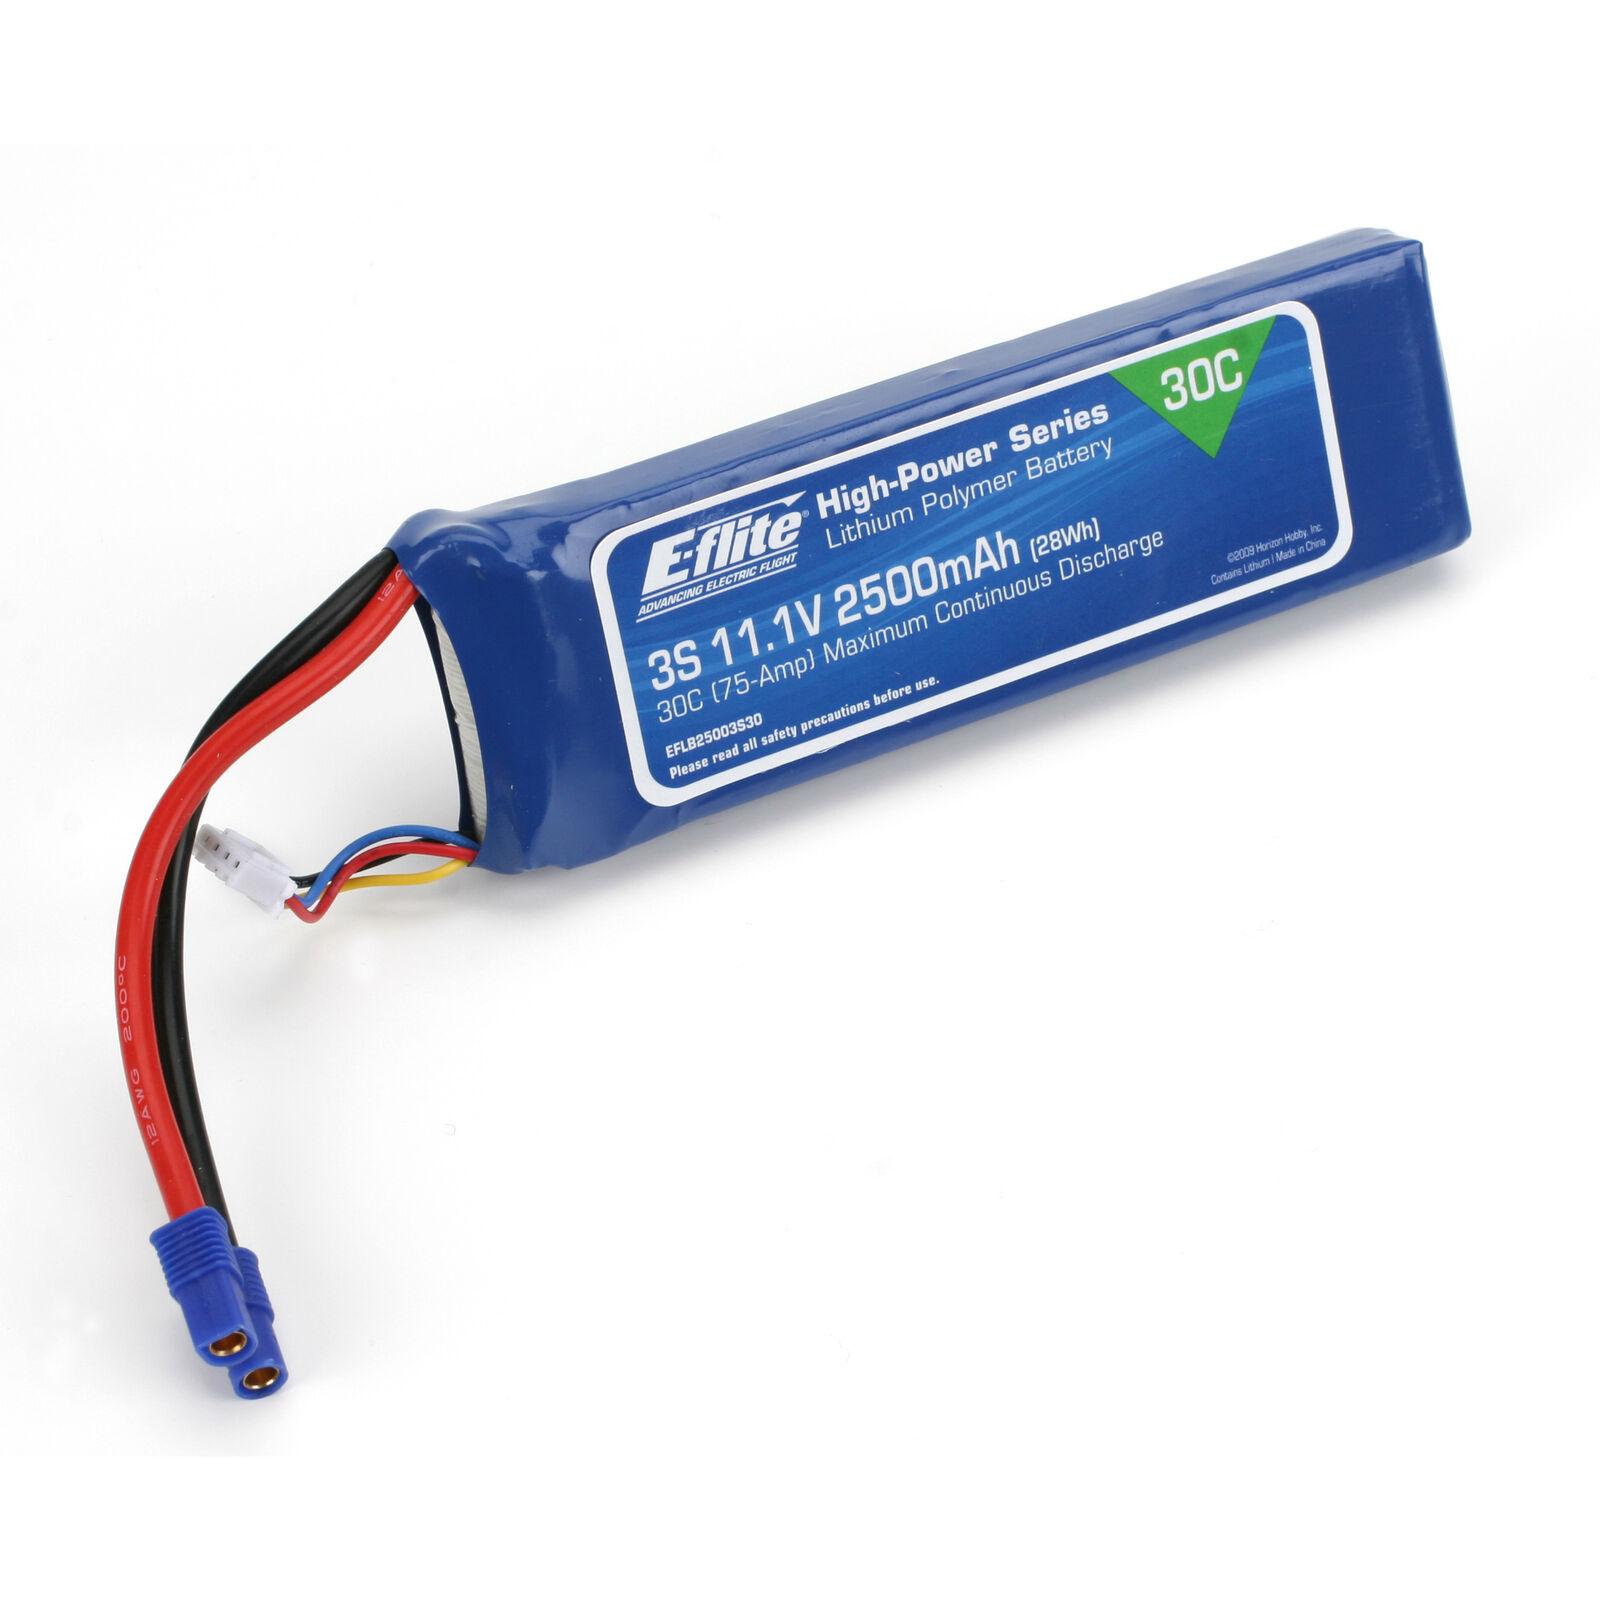 11.1V 2500mAh 3S 30C LiPo, Battery: EC3